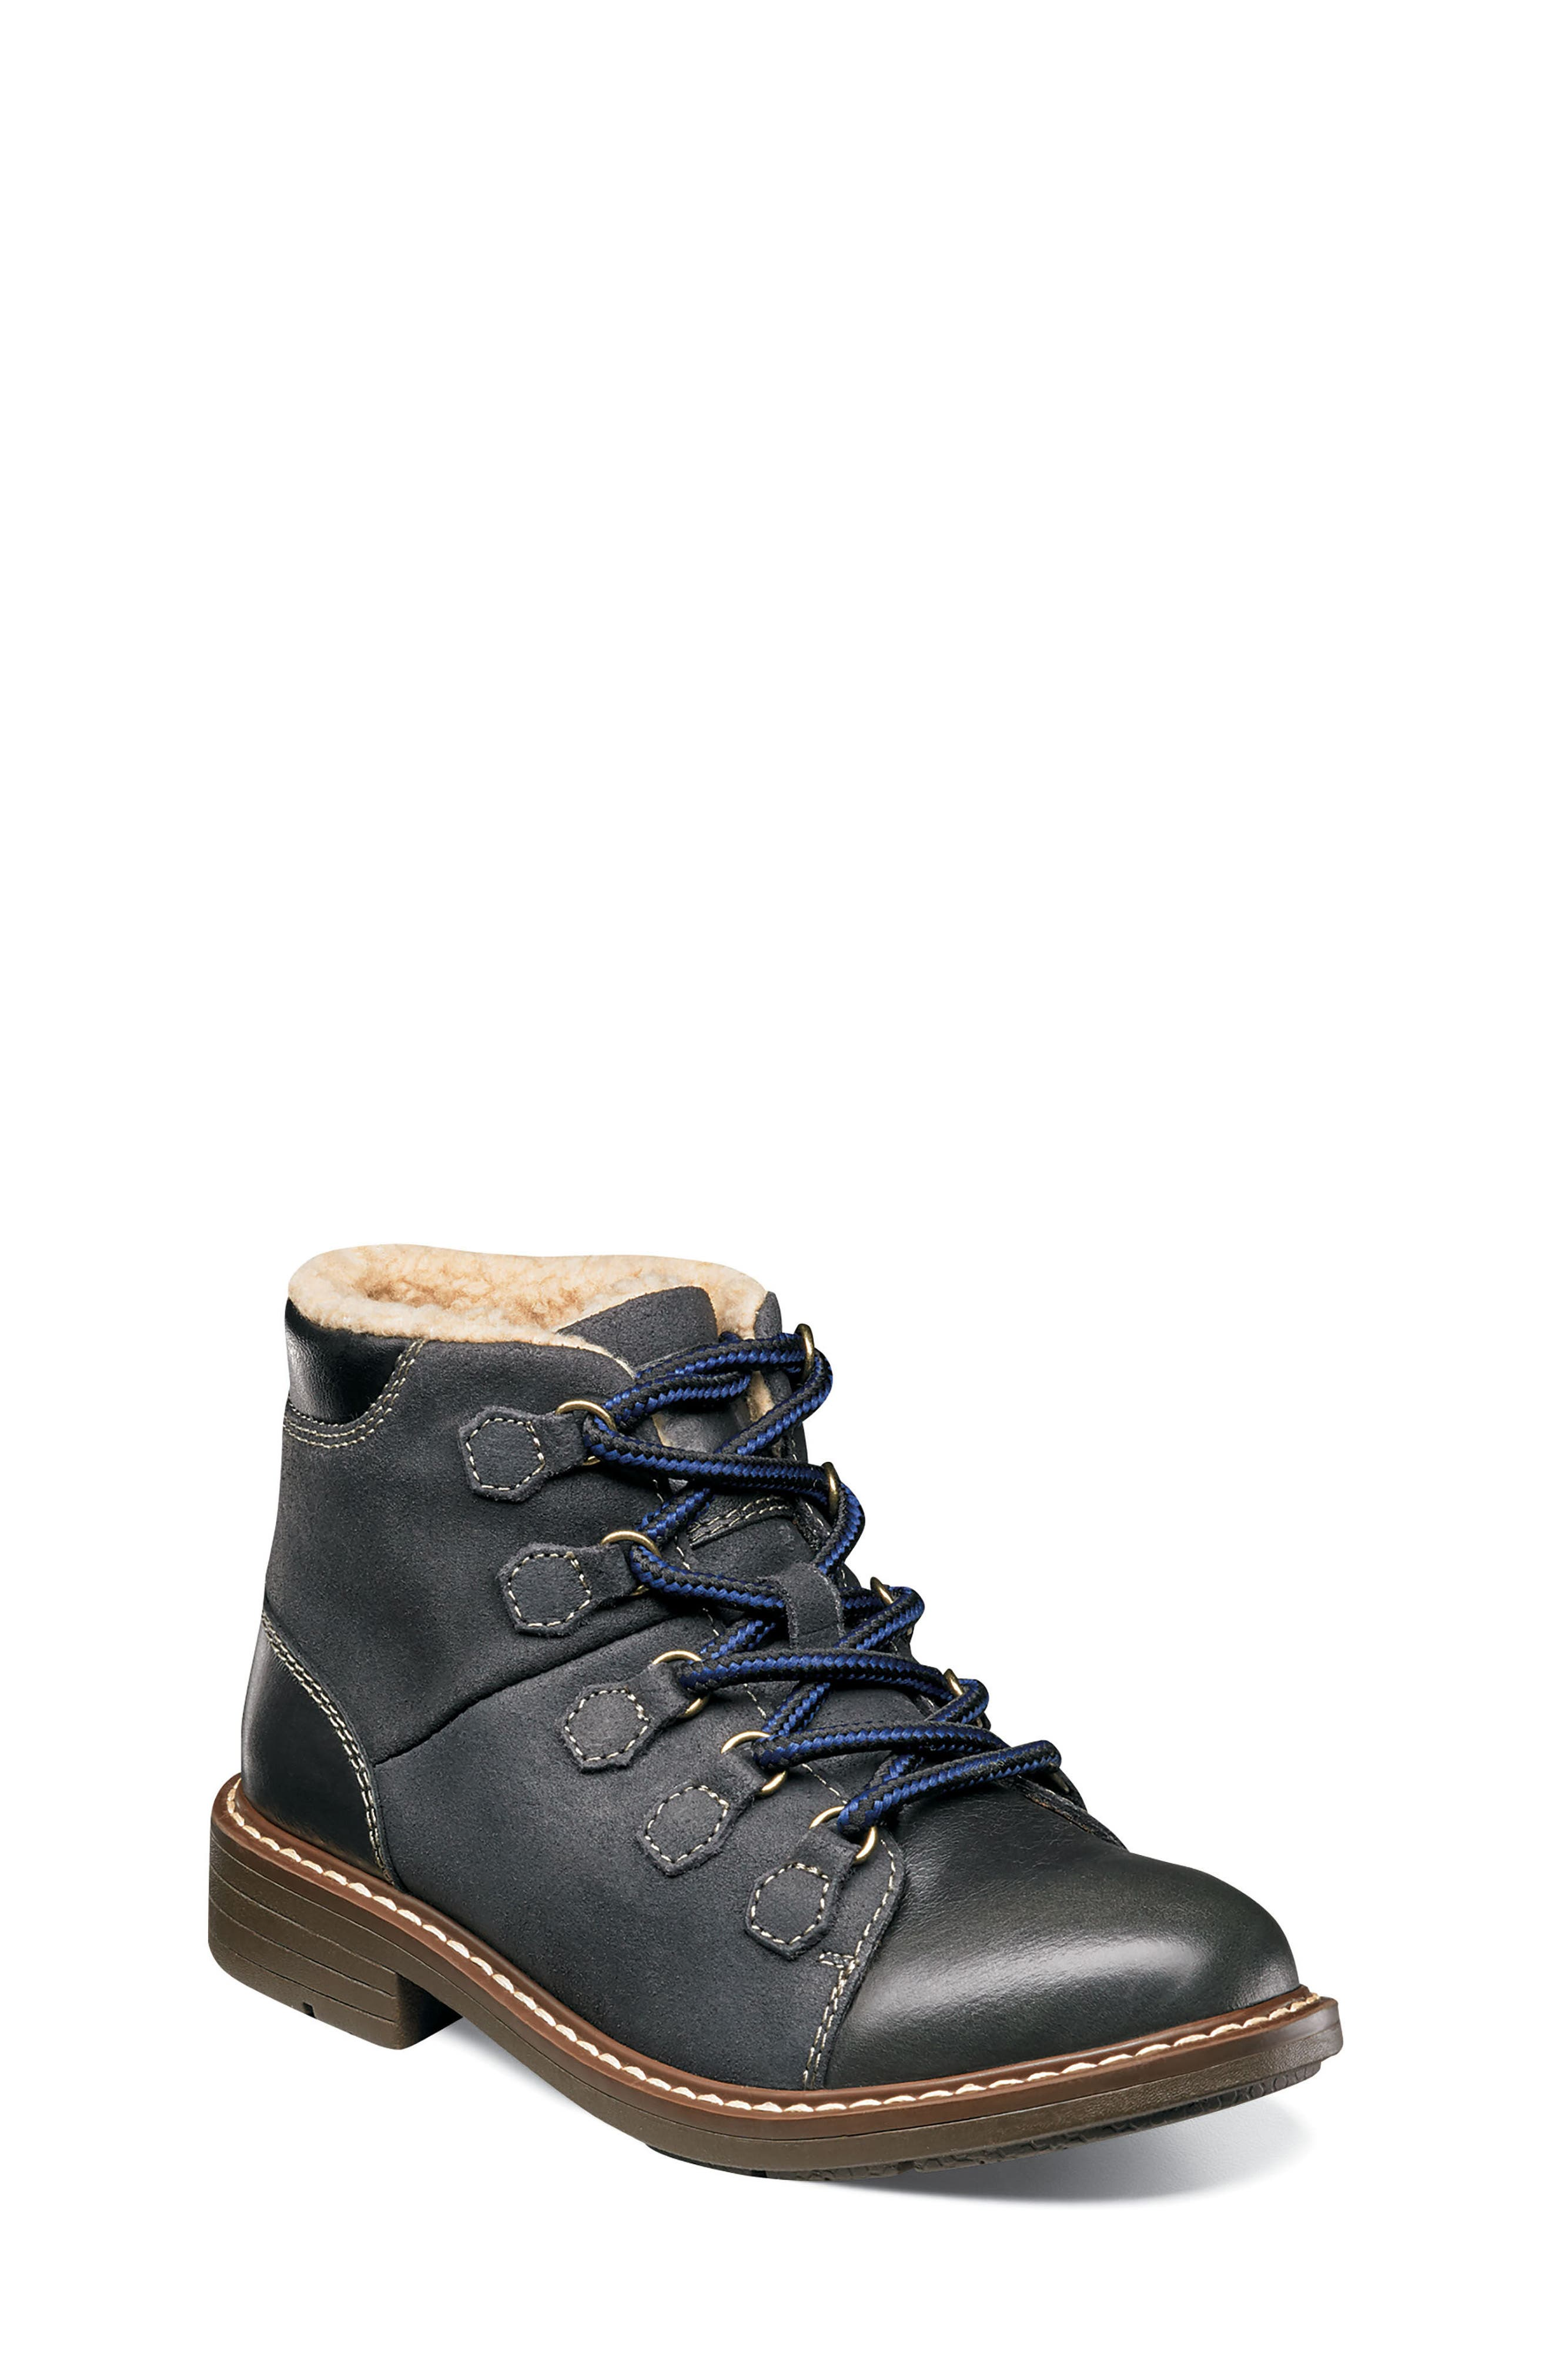 Studio Alpine Plush Lined Boot,                             Main thumbnail 1, color,                             020